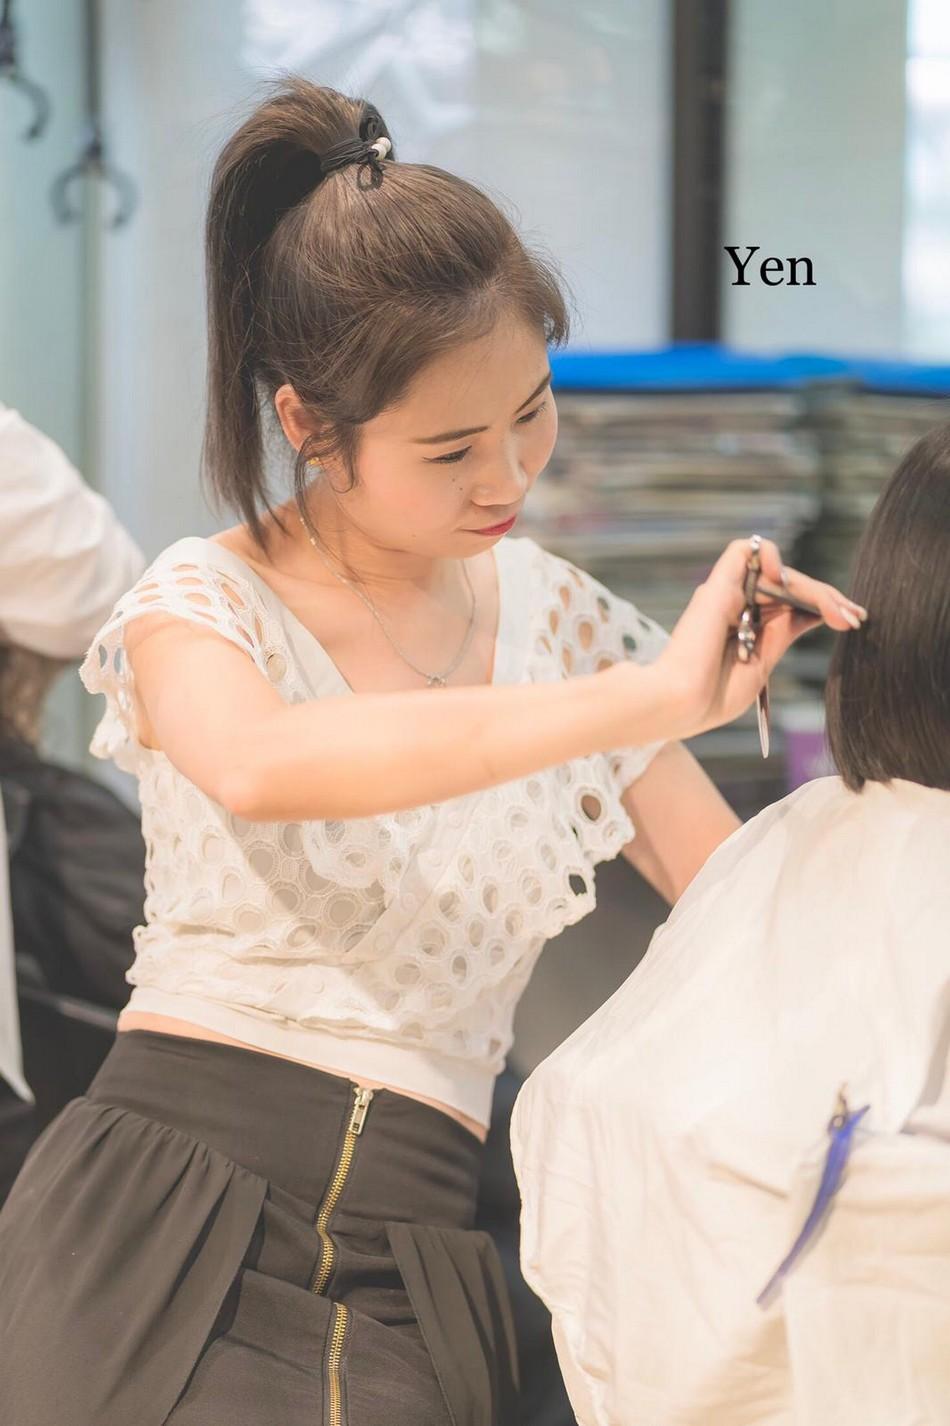 http://www.magic-hairsalon.com/files/2018Yen.jpeg